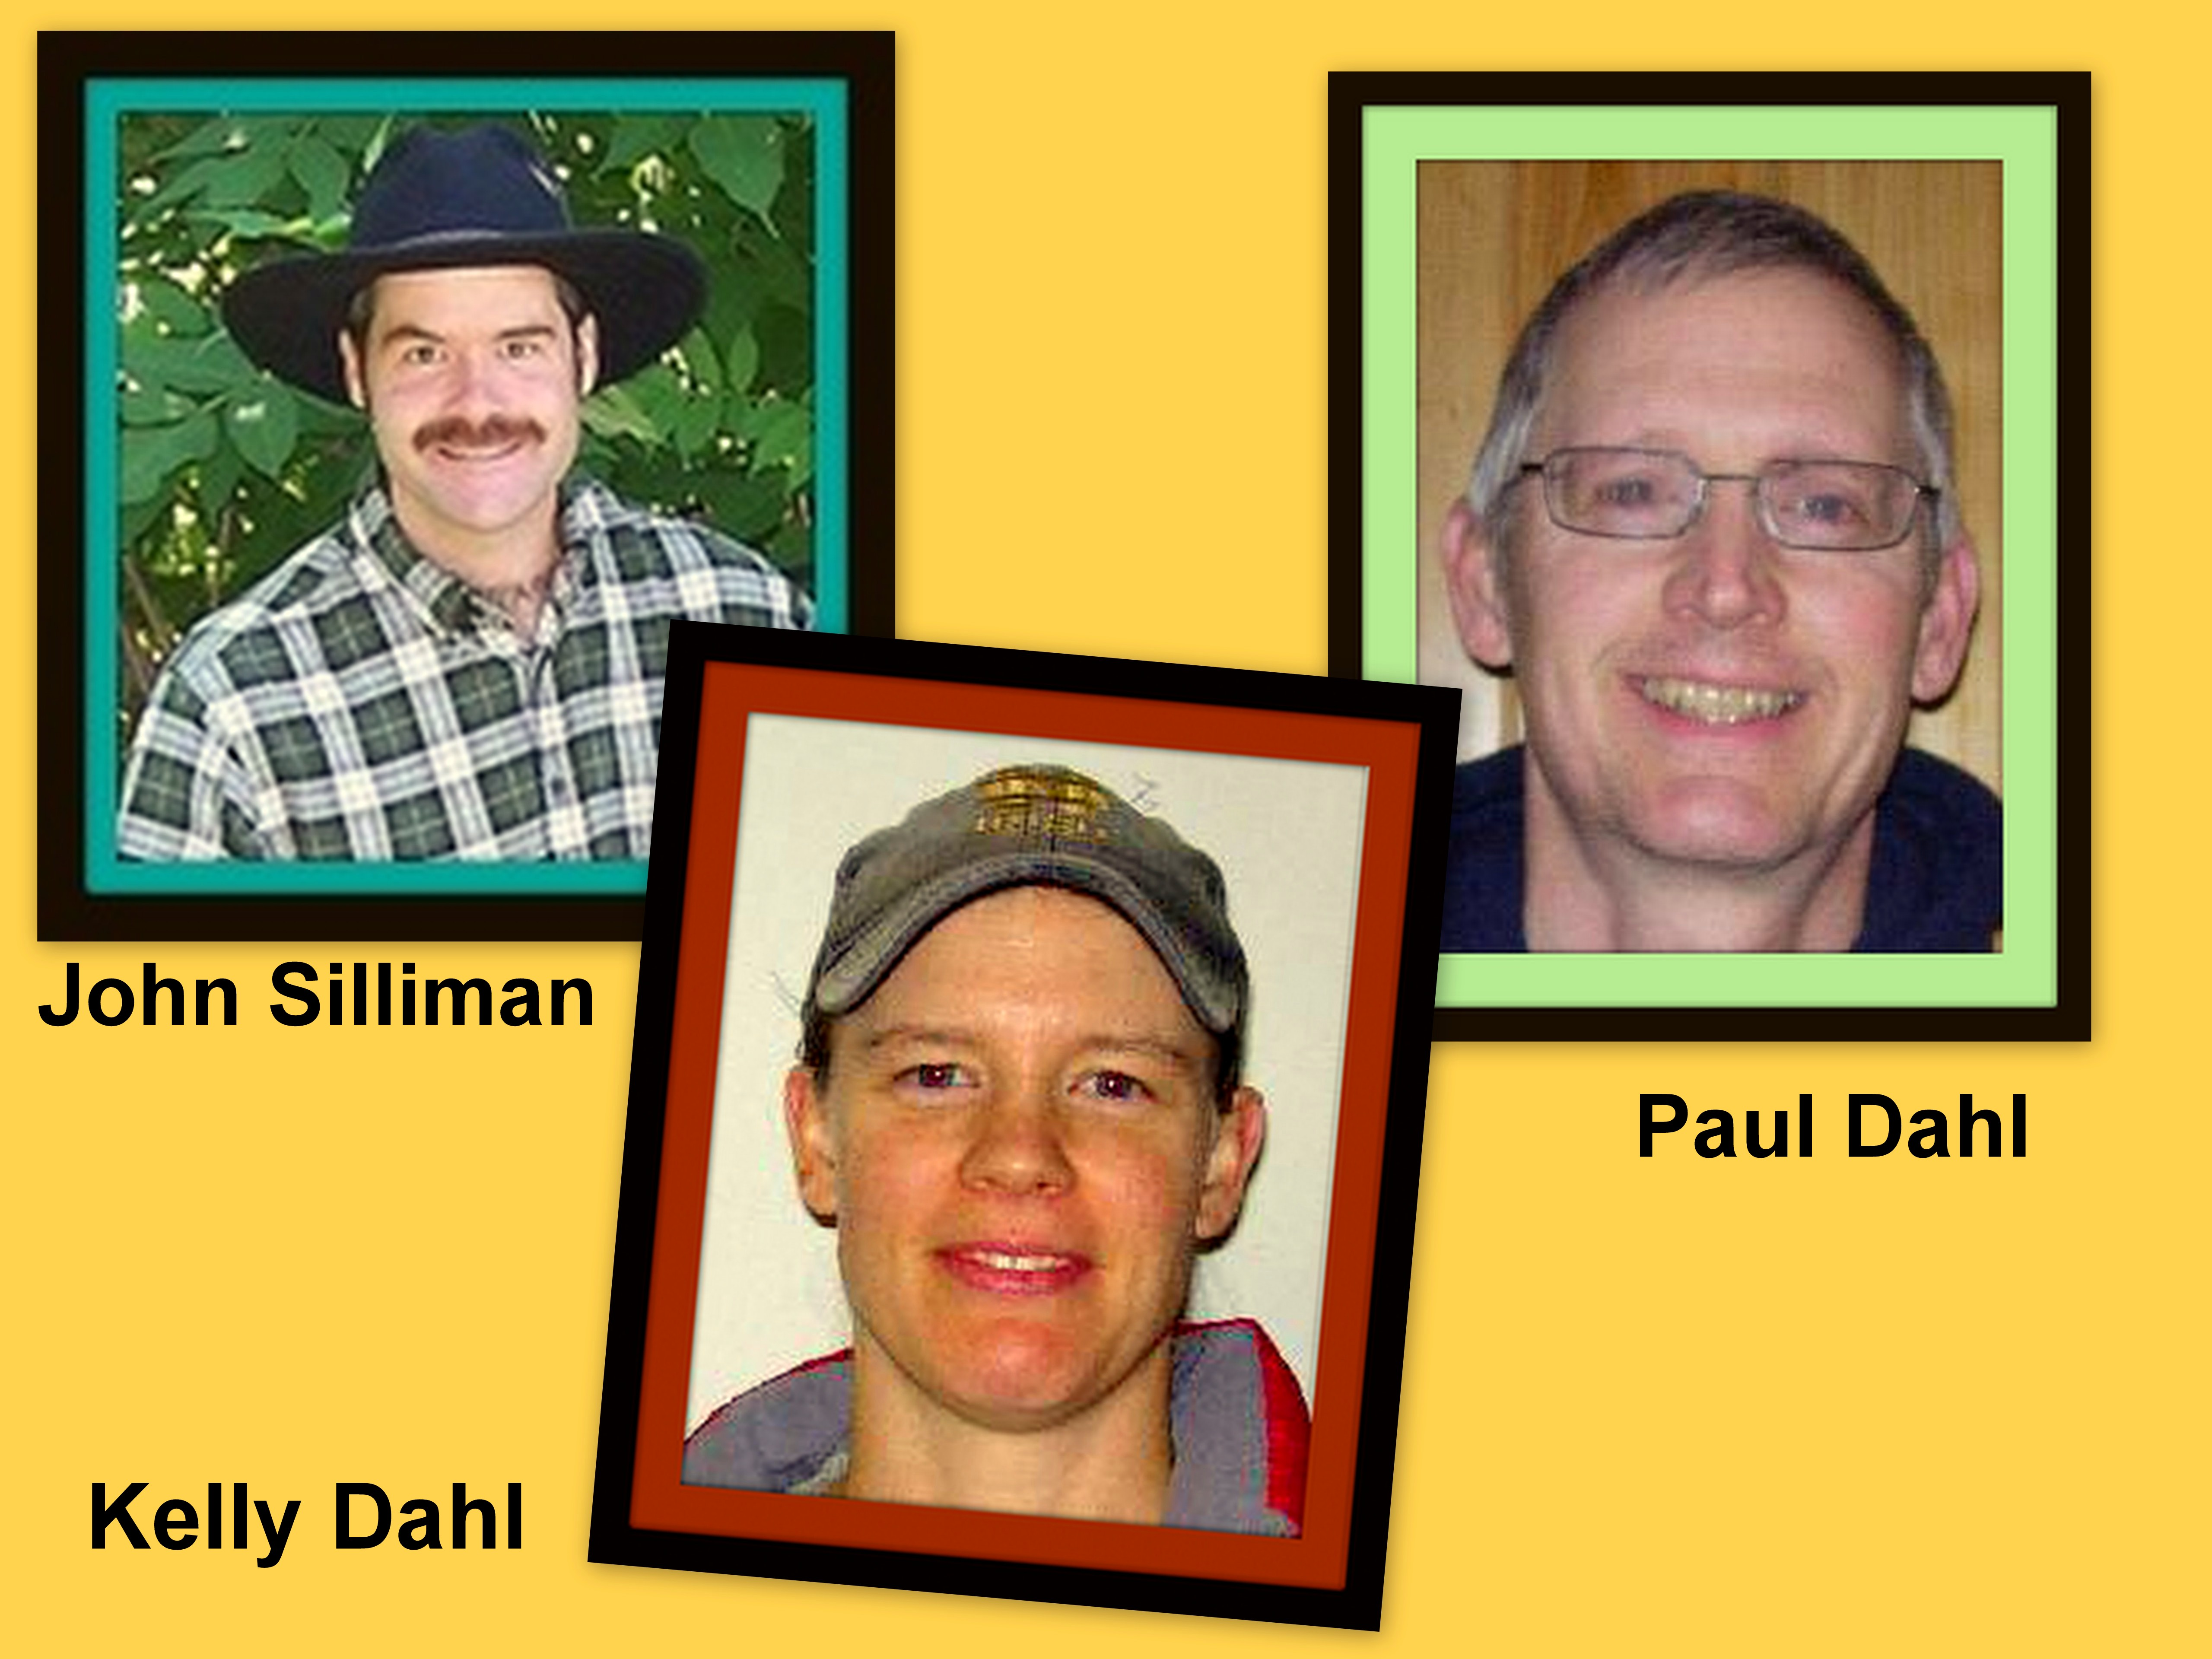 John Silliman, Kelly Dahl and Paul Dahl